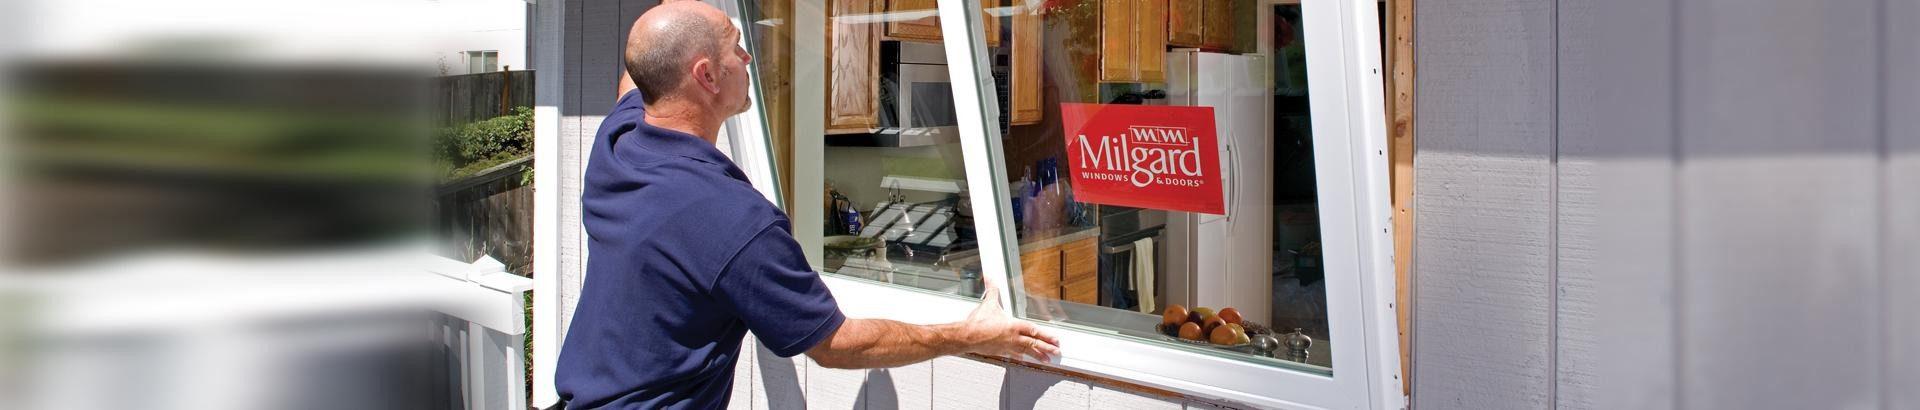 window installation Simi Valley CA